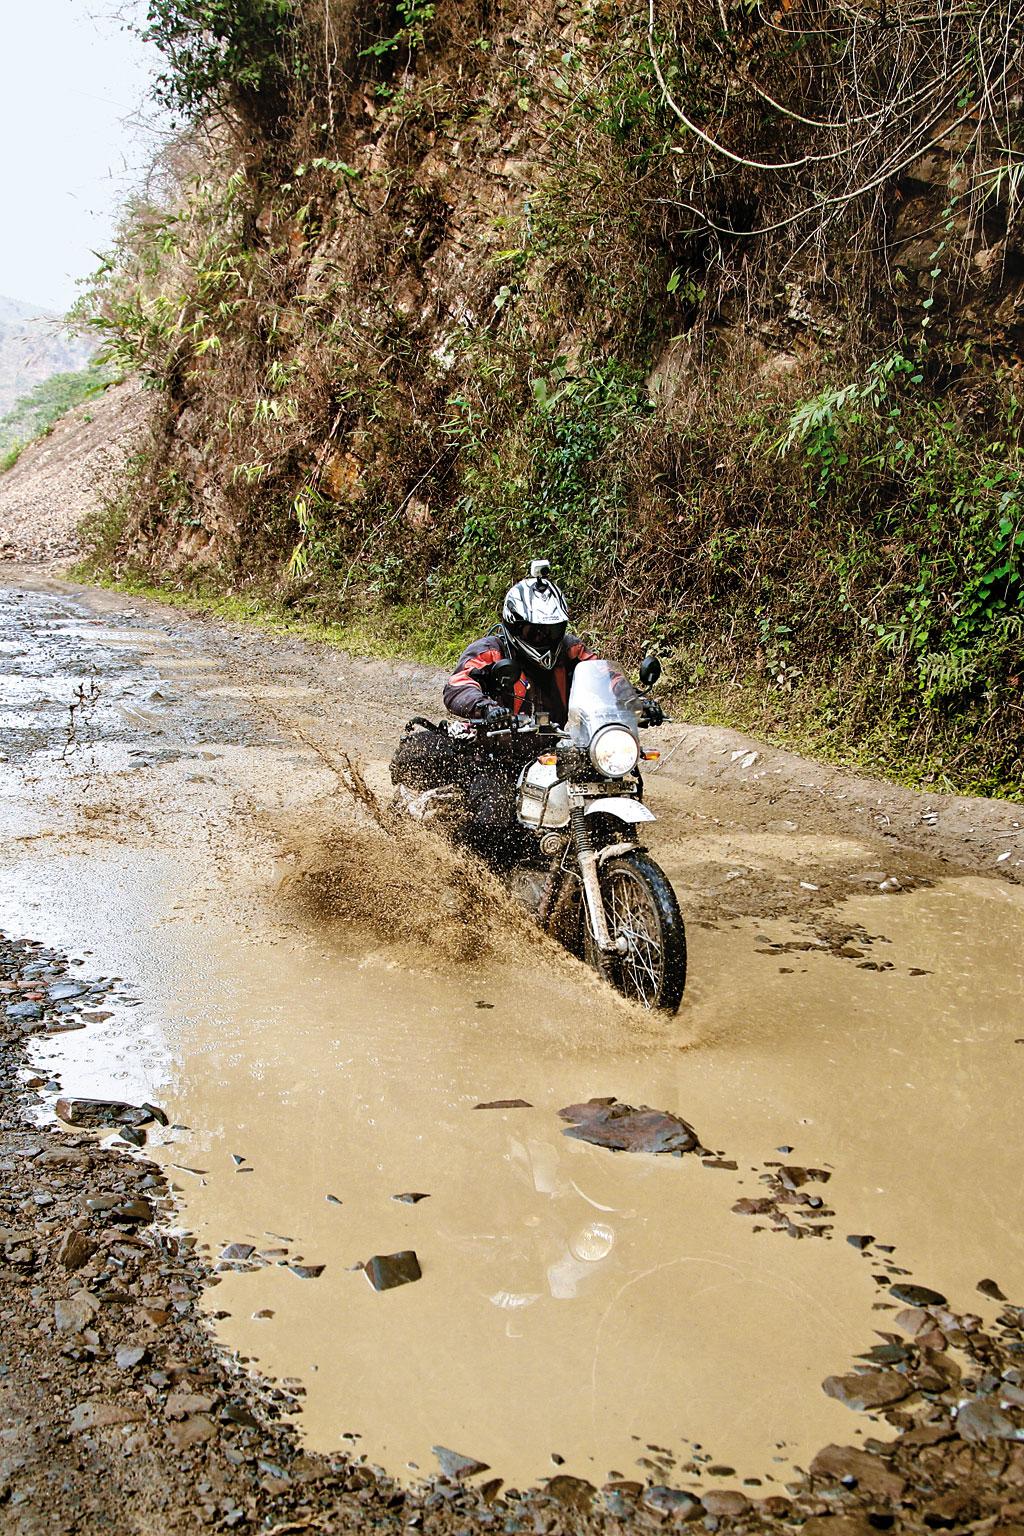 In Search of WWII Plane Crash in Arunachal Pradesh - Outlook Traveller